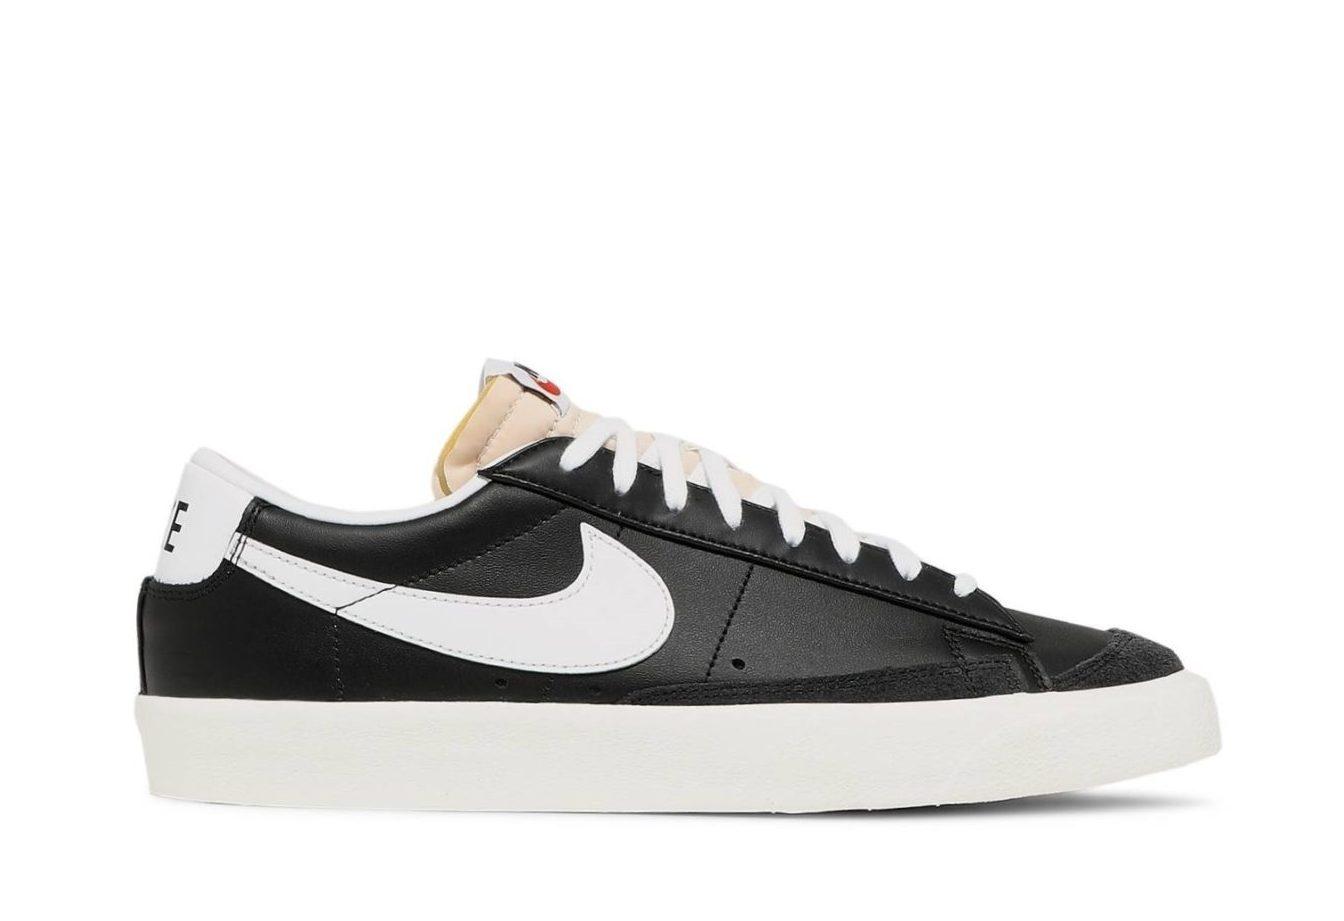 8Krossovki-Nike-Blazer-Low-77-Vintage-Black-White-scaled-e1625780597643